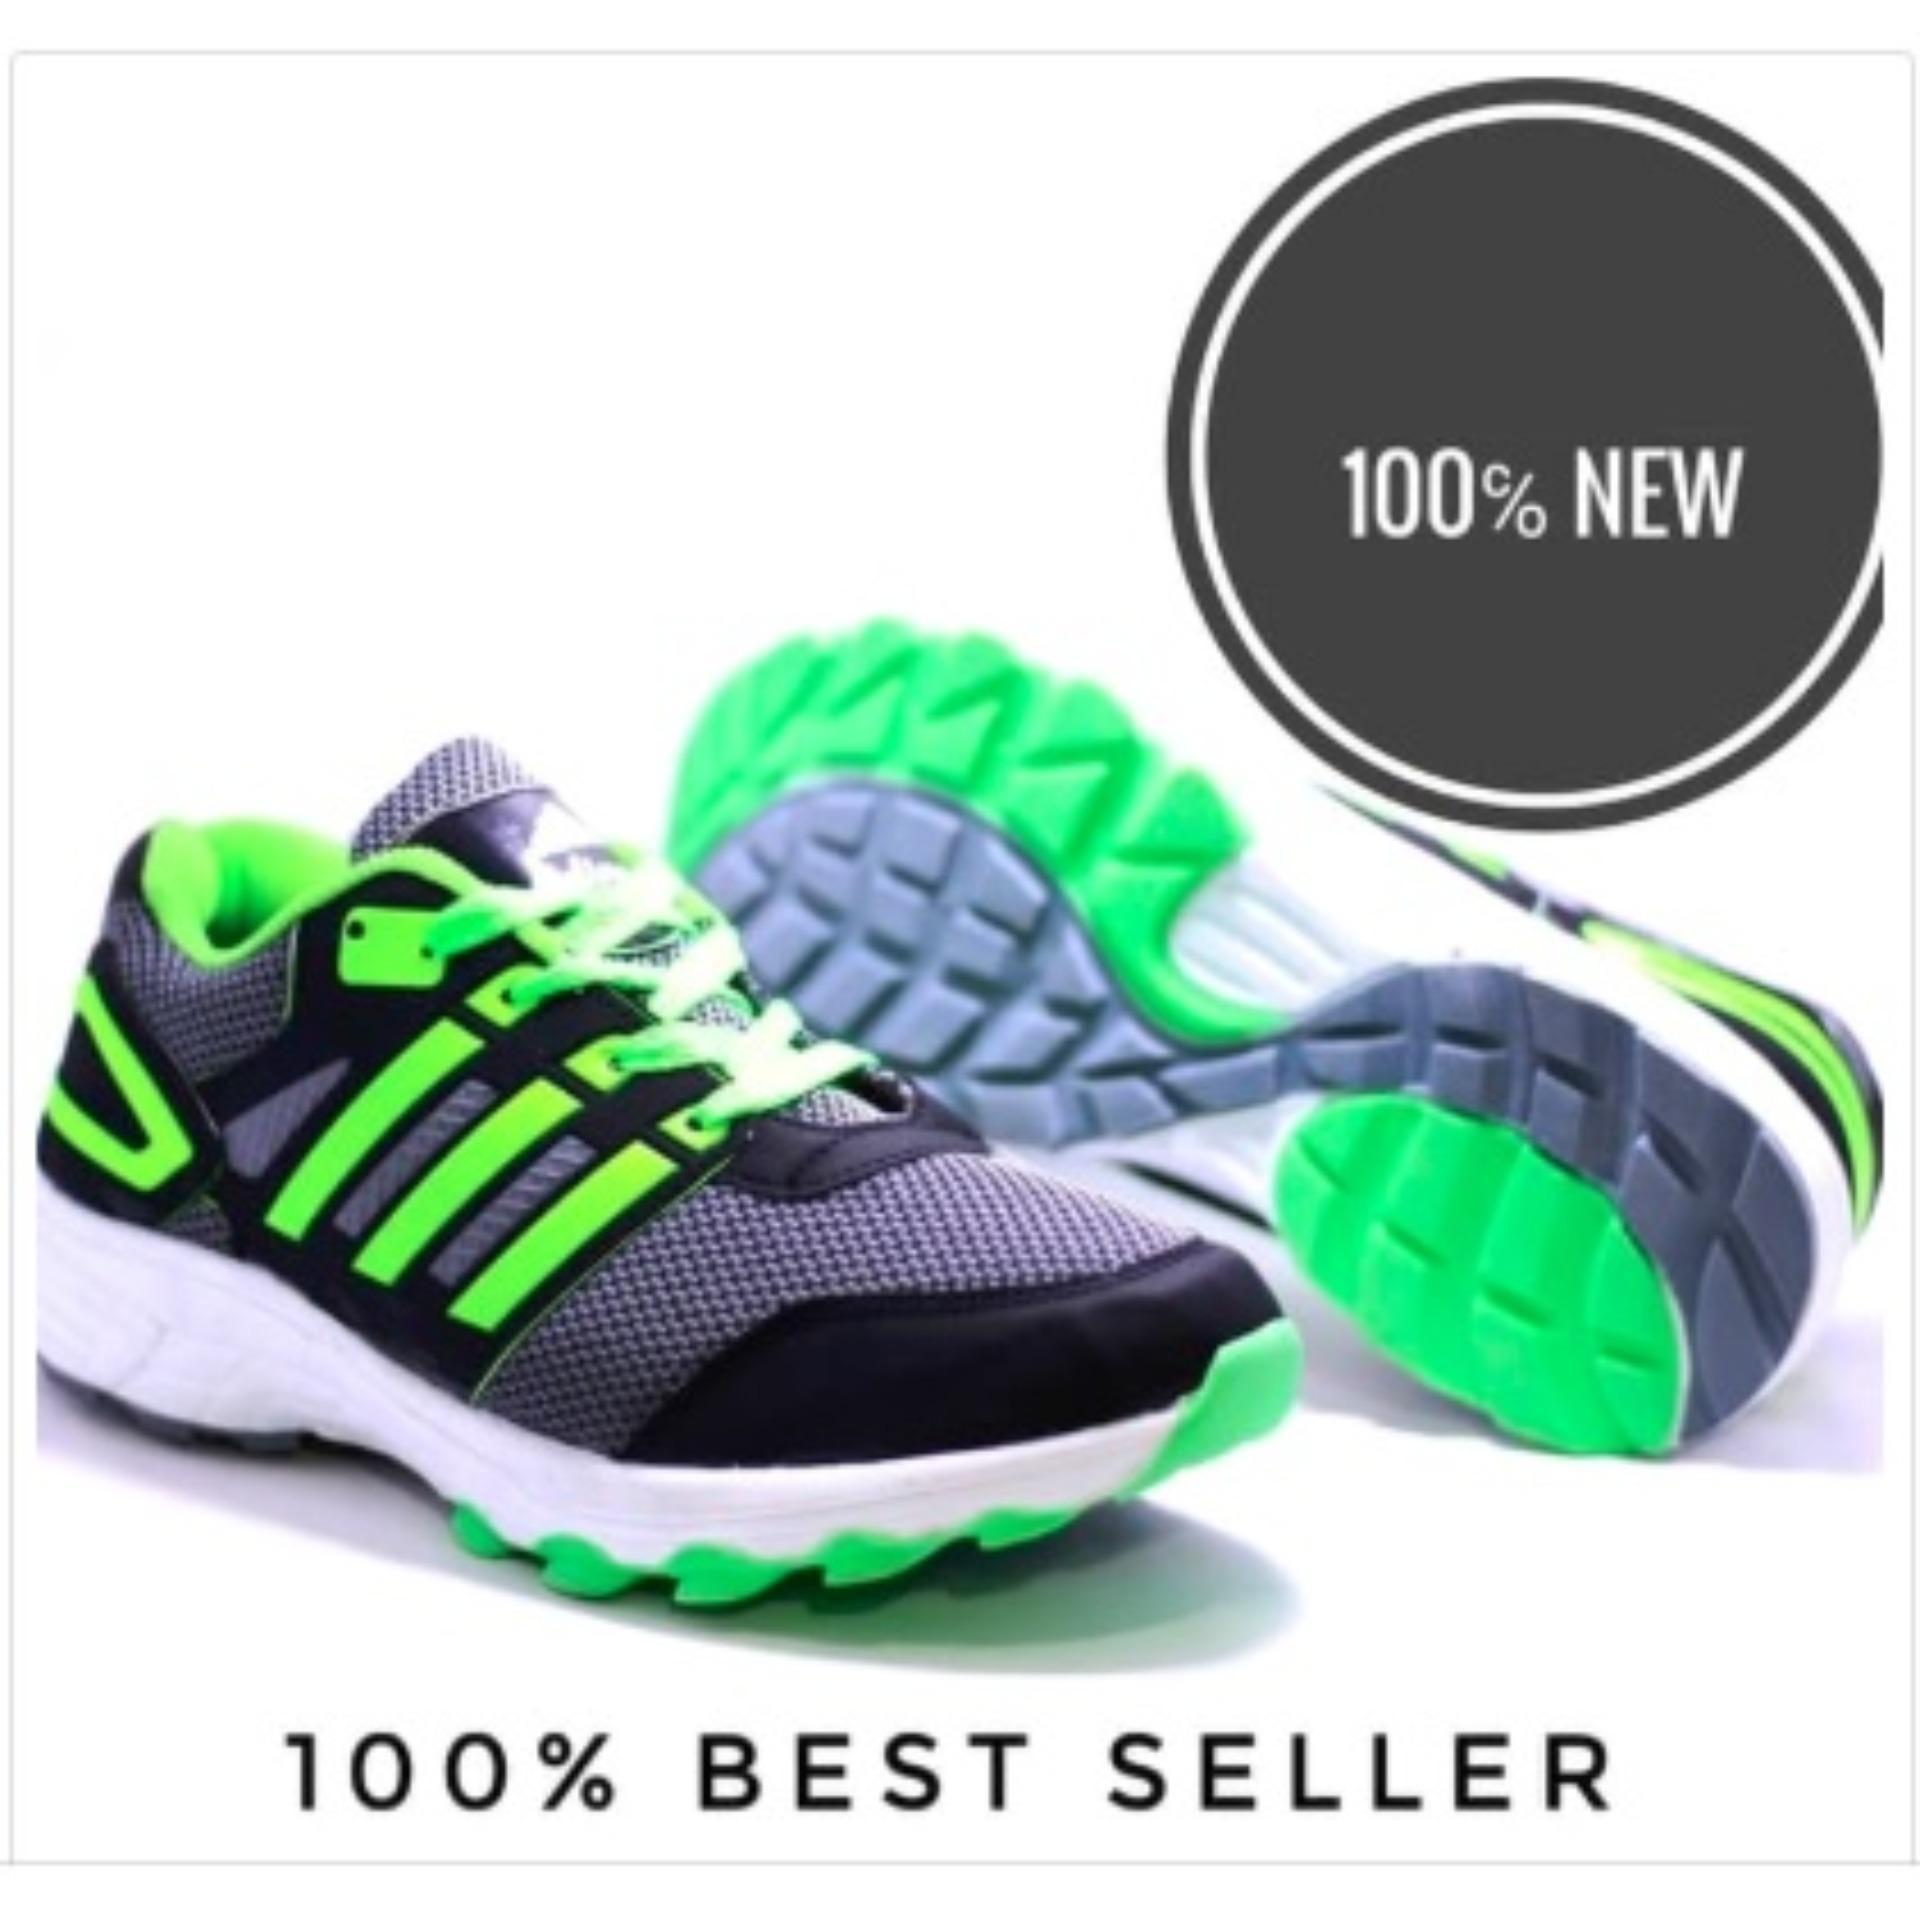 749ec6ab036d Adinova Shoes Sepatu Sport Pria Sepatu Sneaker Pria   Sepatu Olahraga Sepatu  Lari